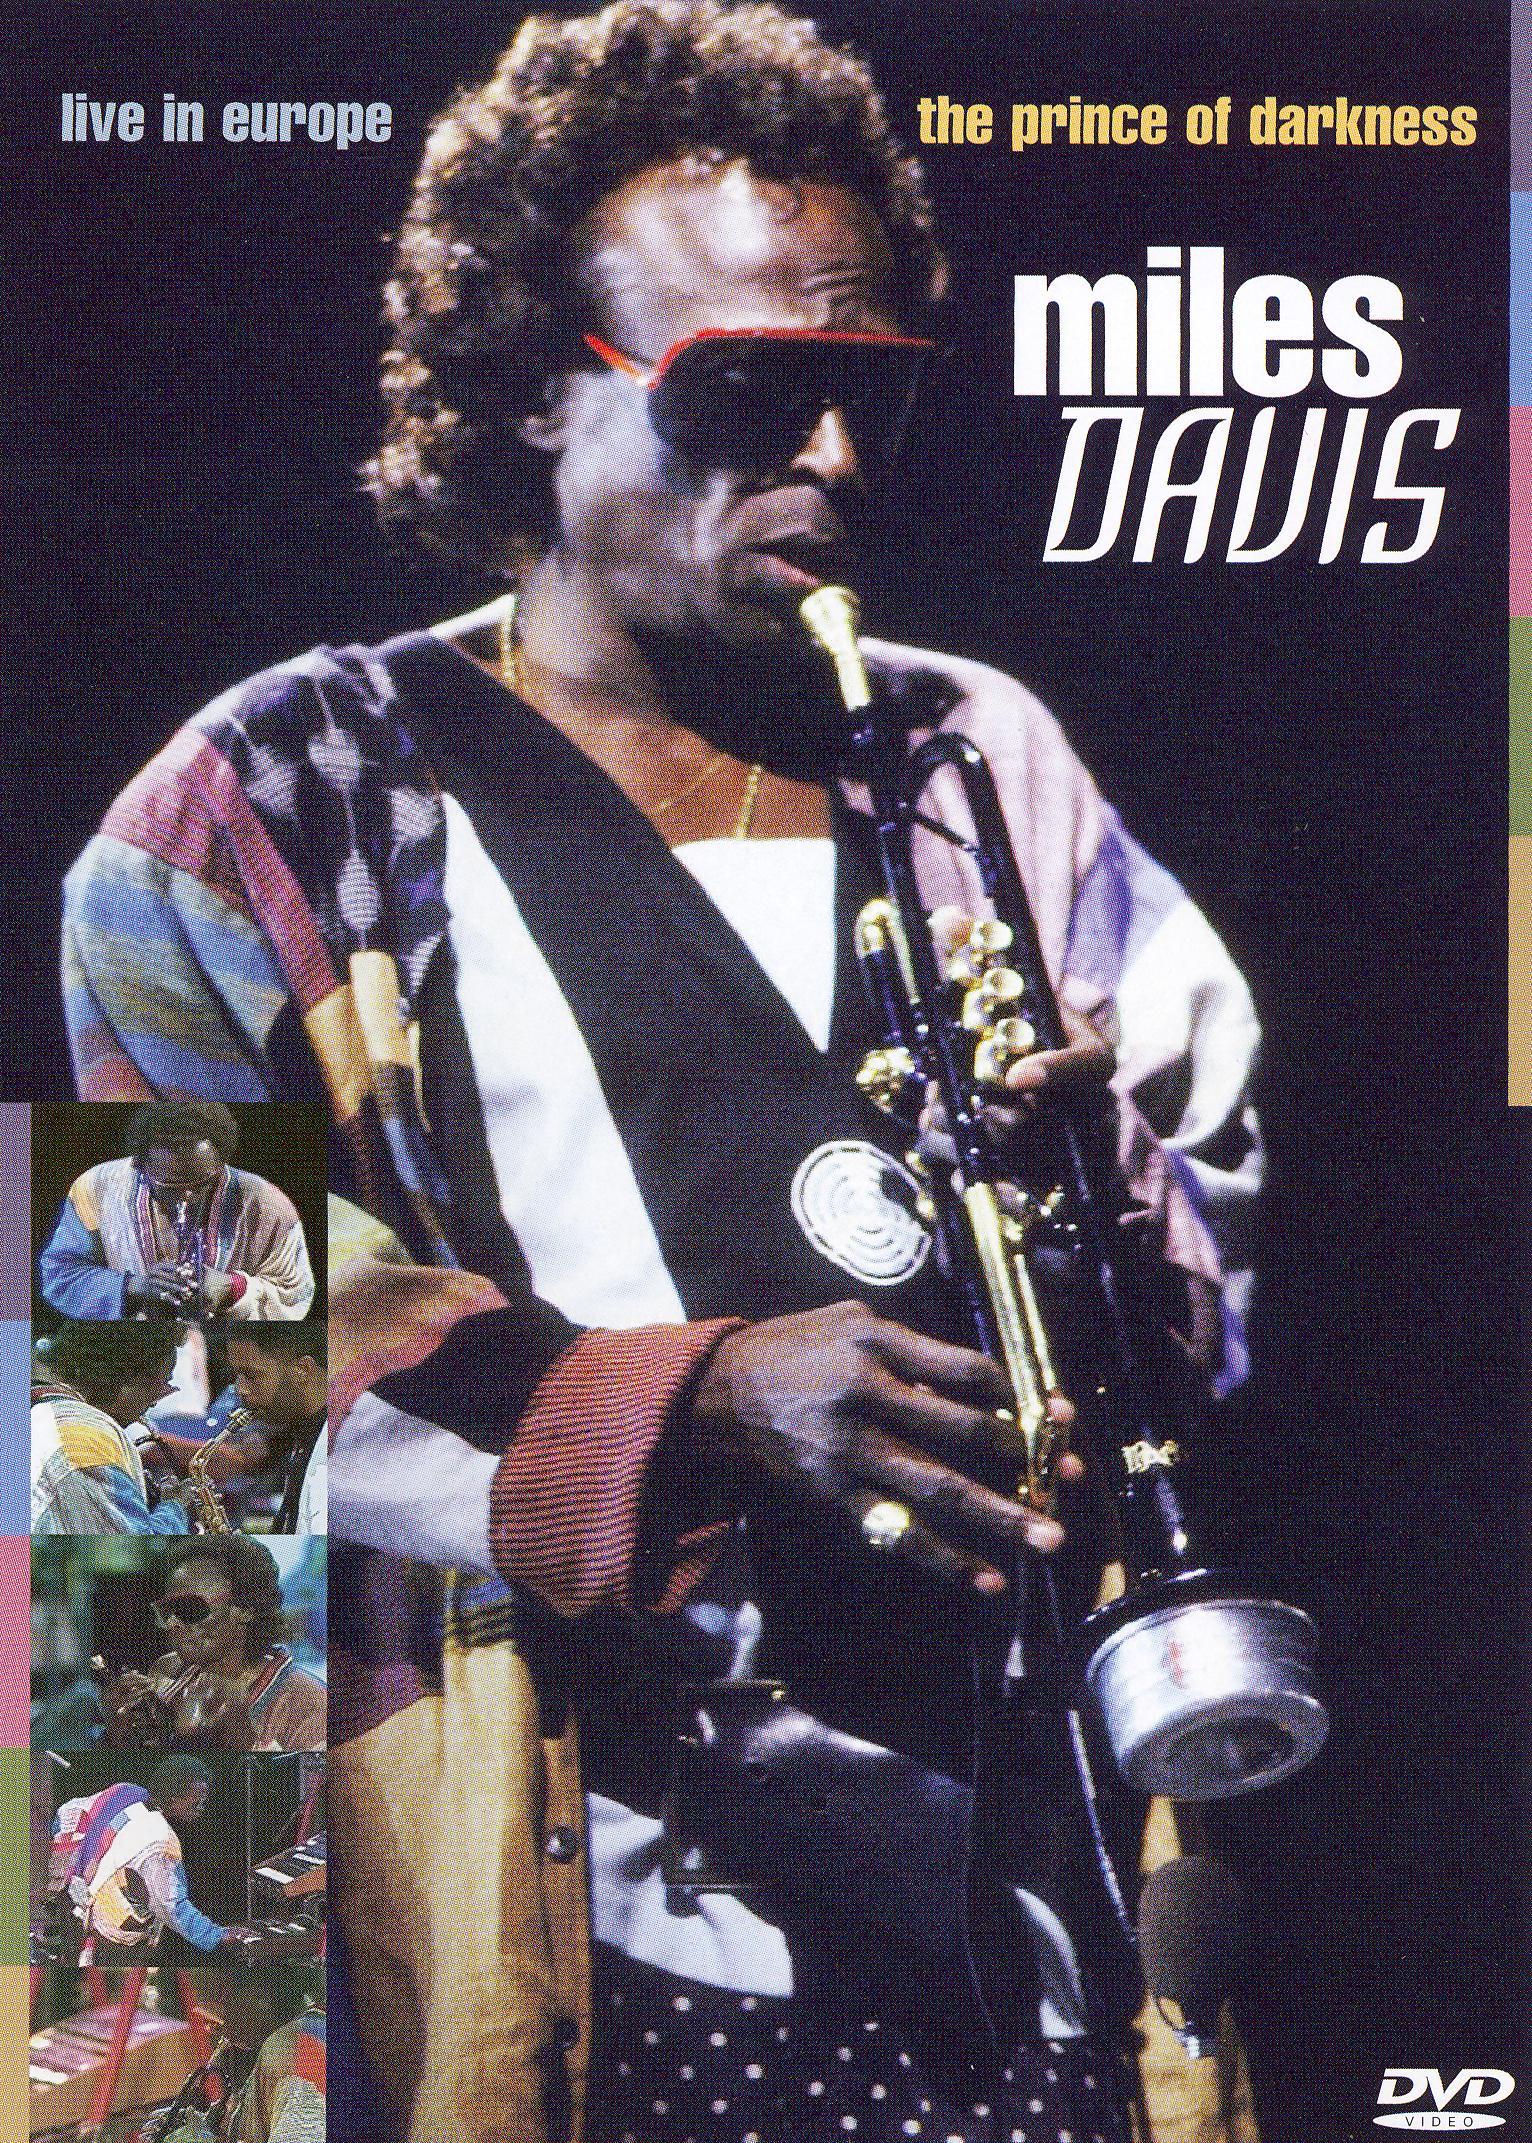 Miles Davis: Prince of Darkness